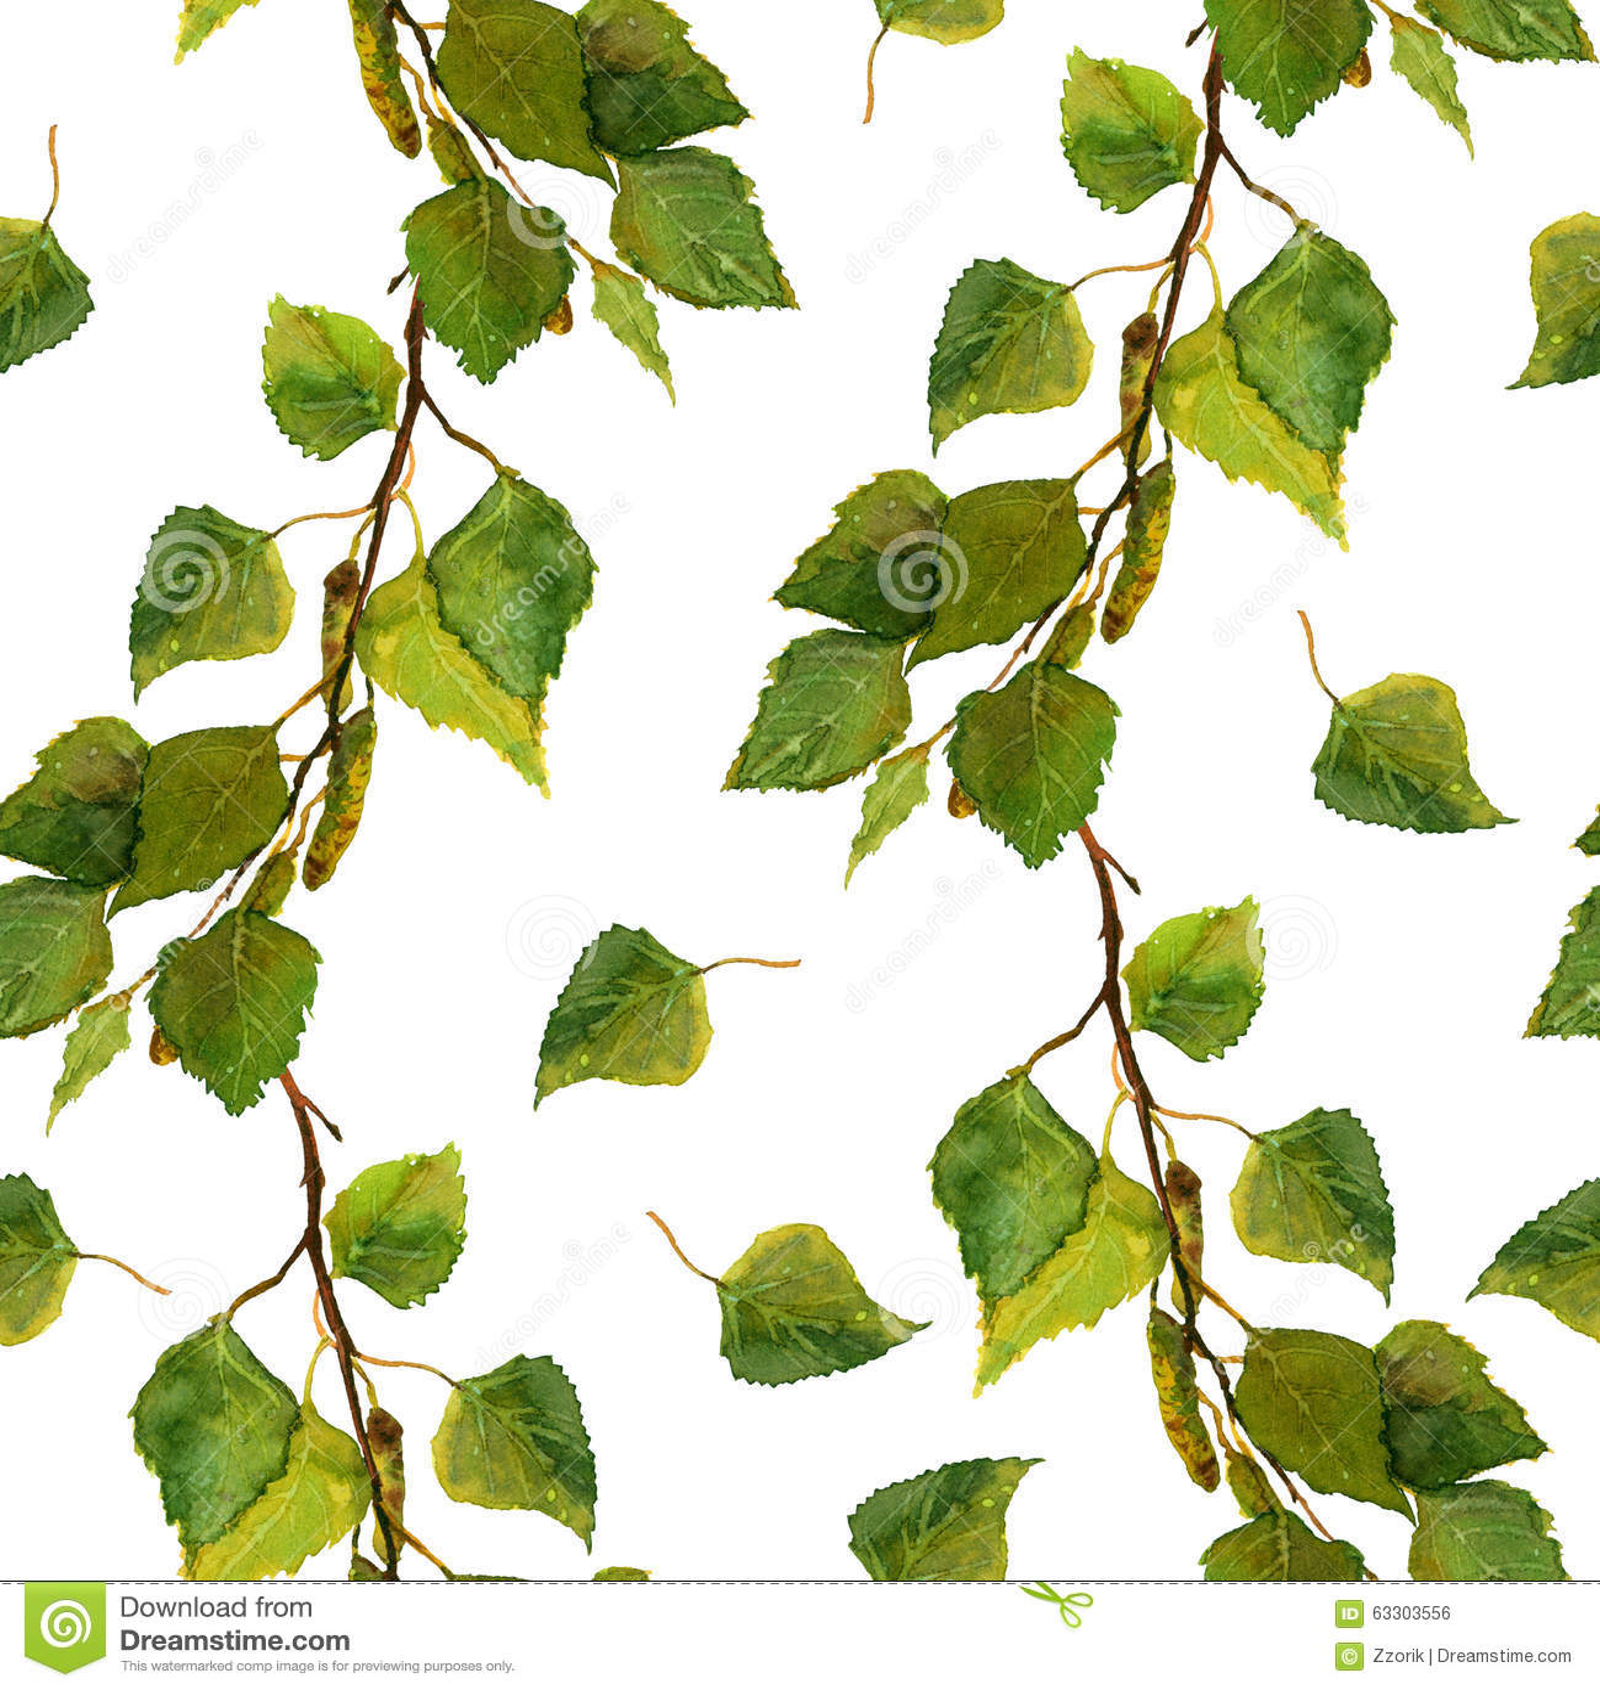 la carta da parati senza cuciture bianca con le foglie verdi della ... - Carta Da Parati Bianca Da Dipingere